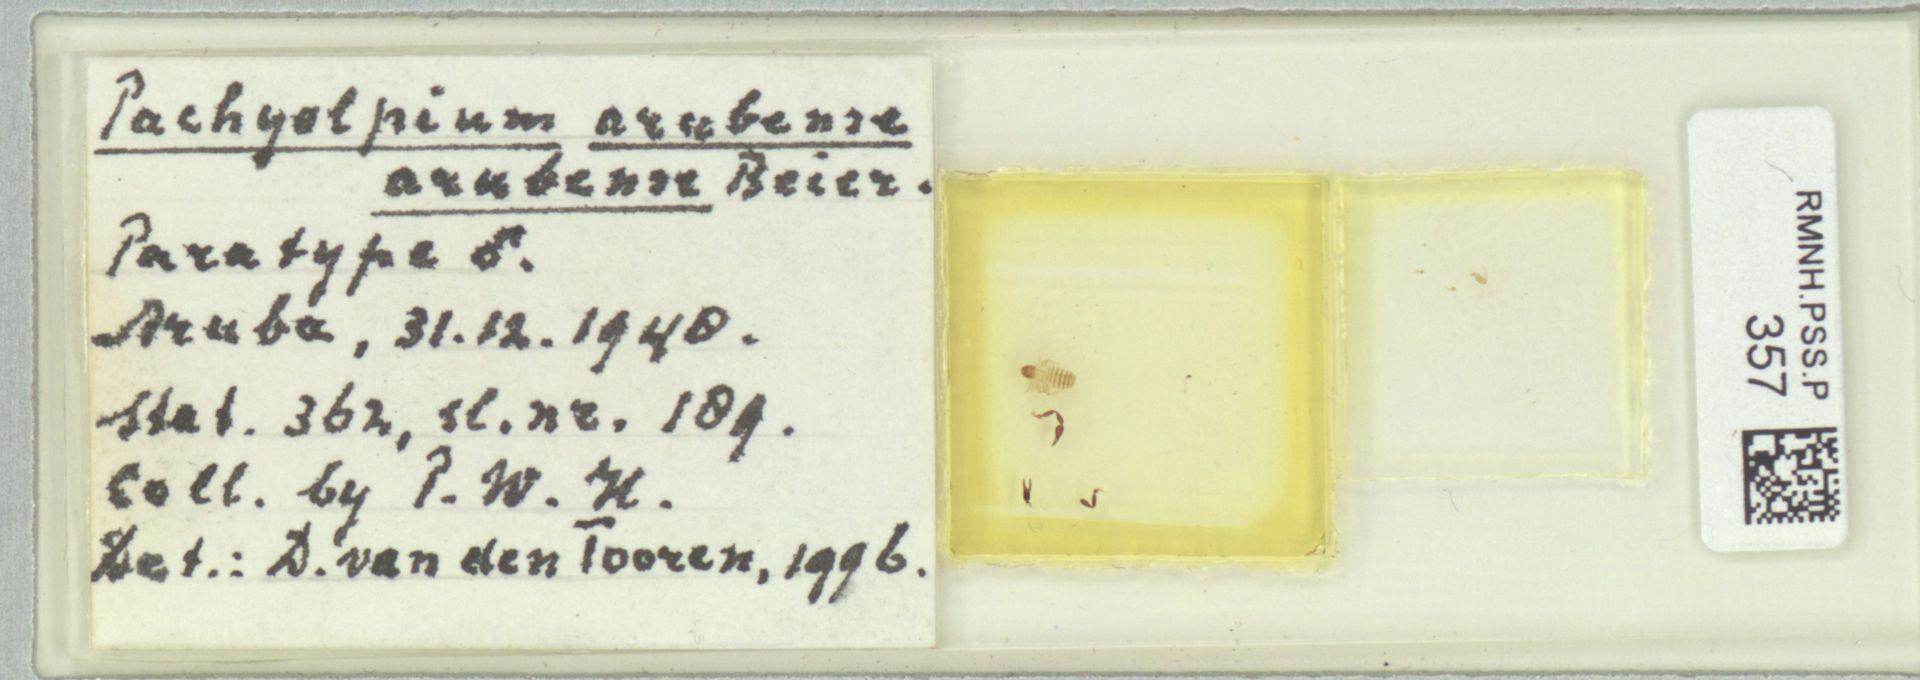 RMNH.PSS.P.357 | Pachyolpium arubense arubense